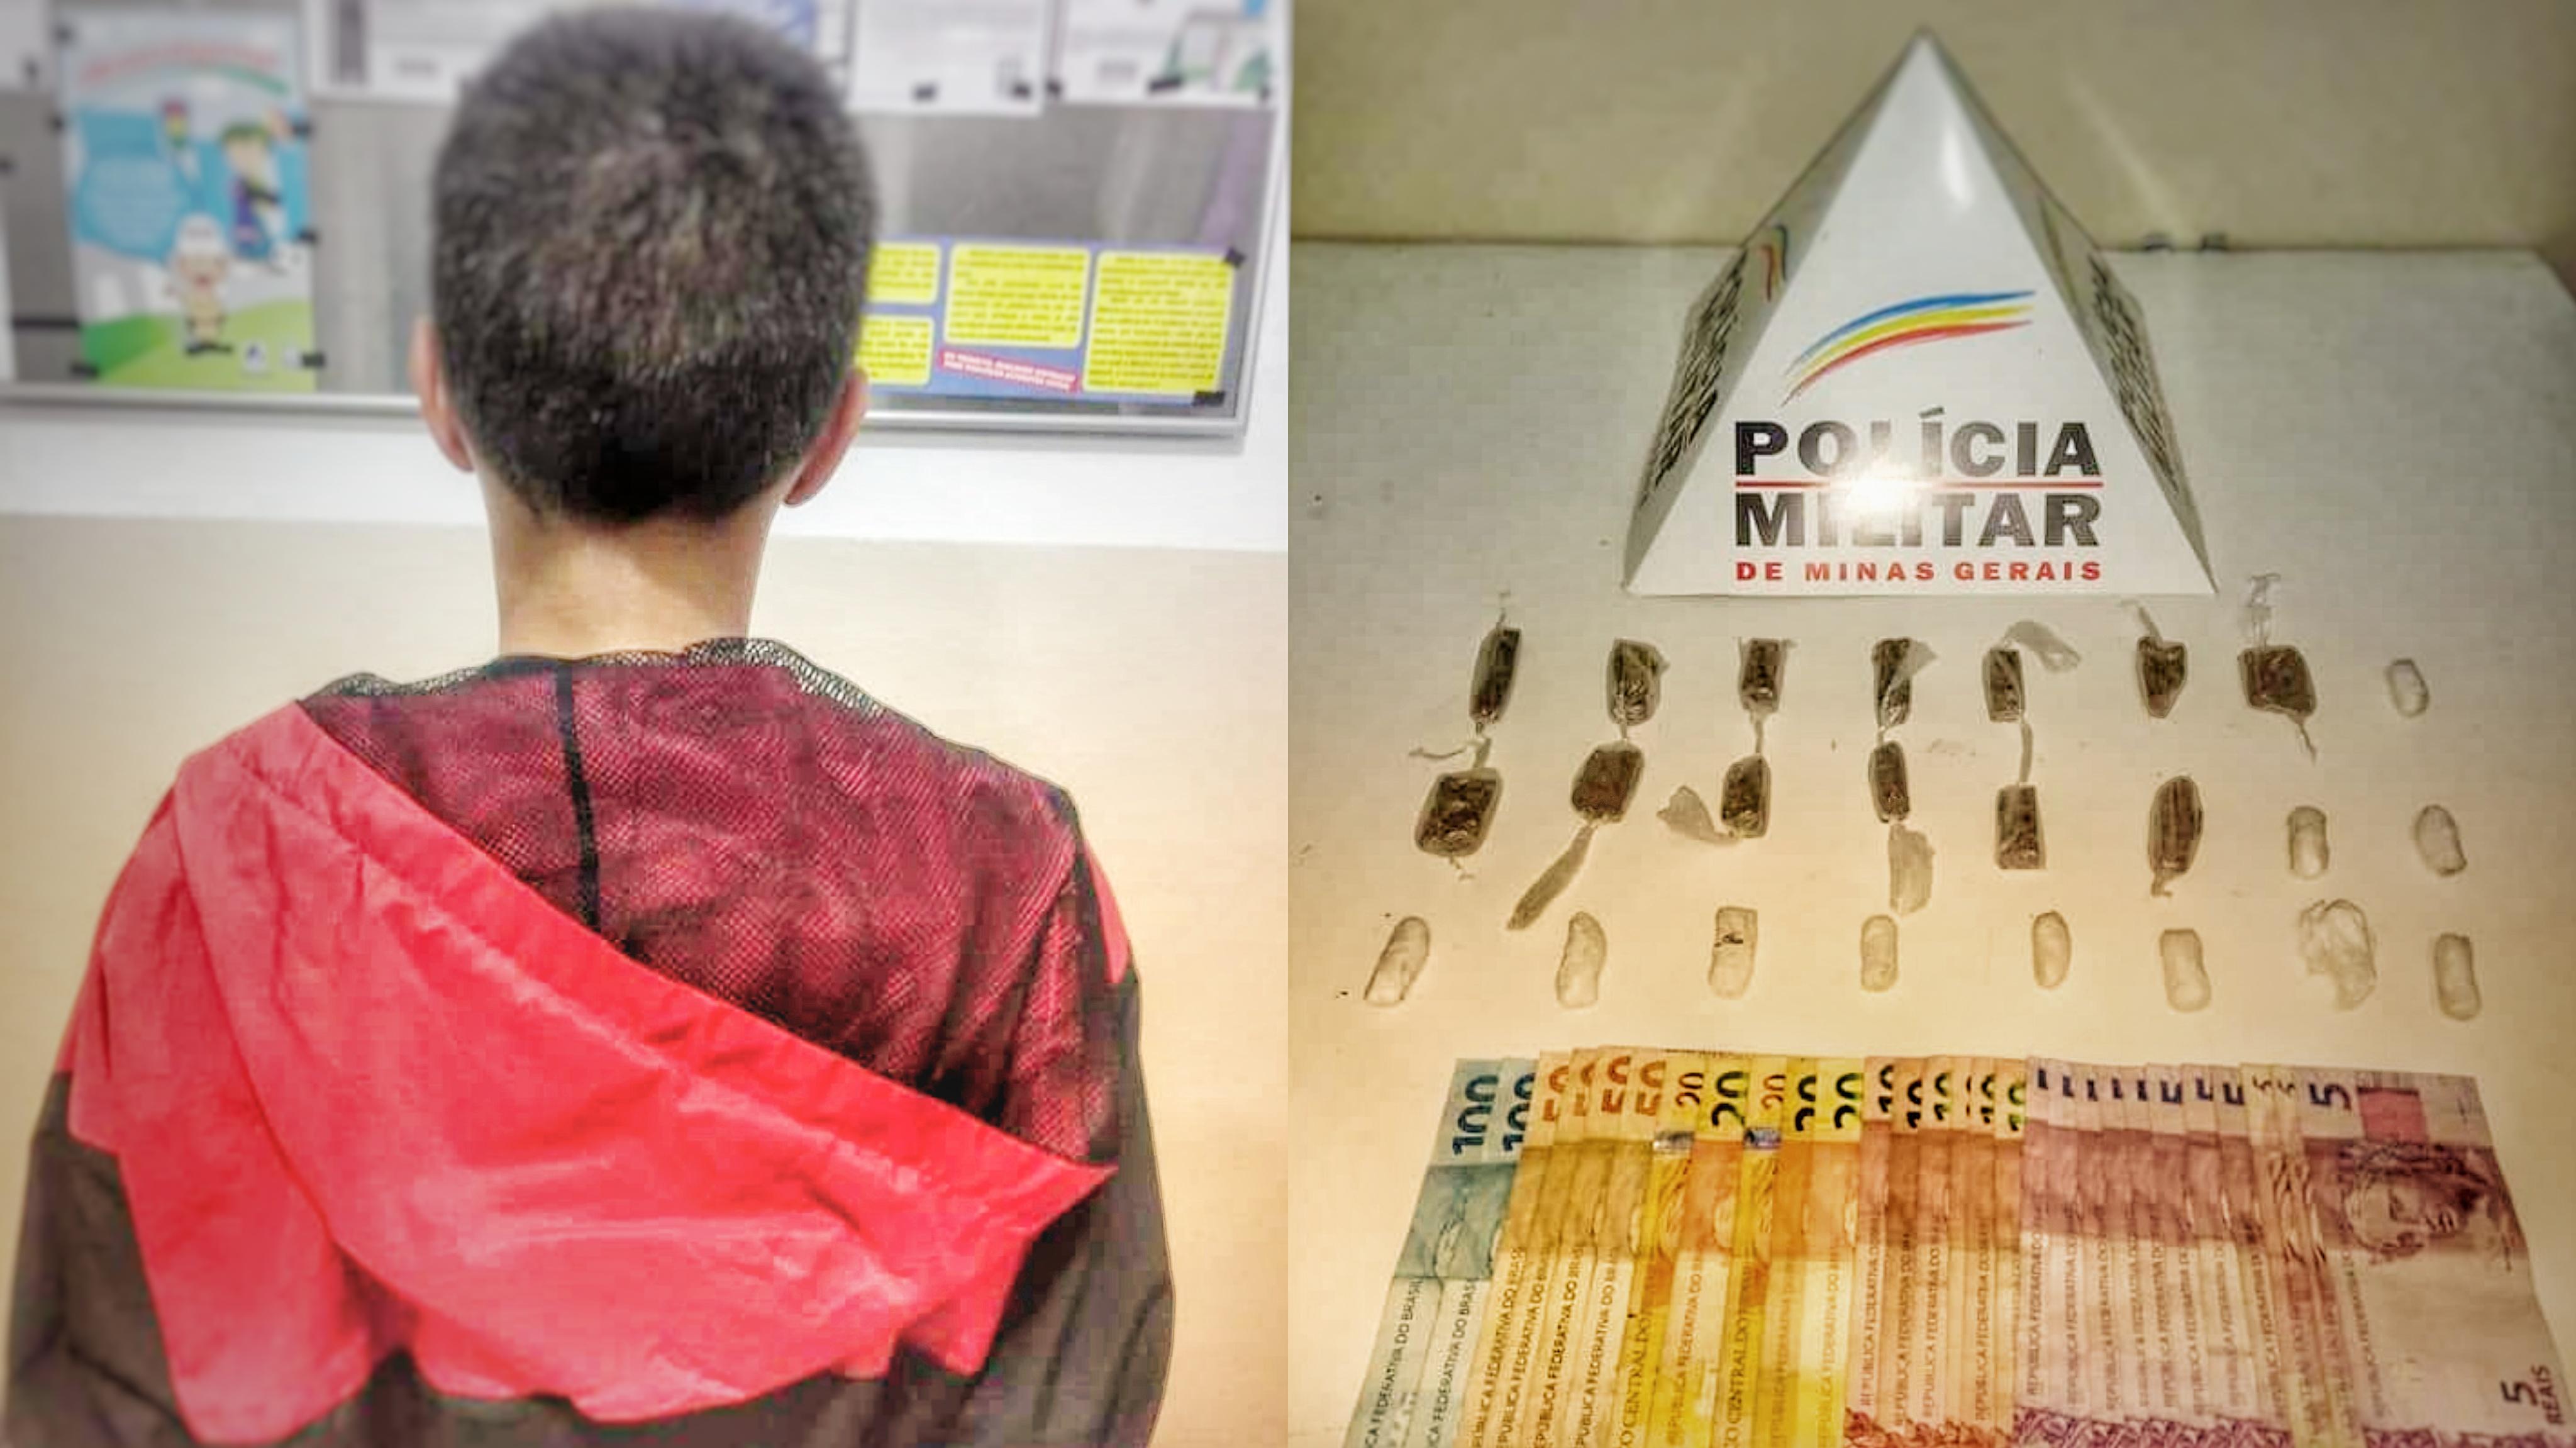 Menino de 13 anos, apreendido por suspeita de tráfico em Pouso Alegre